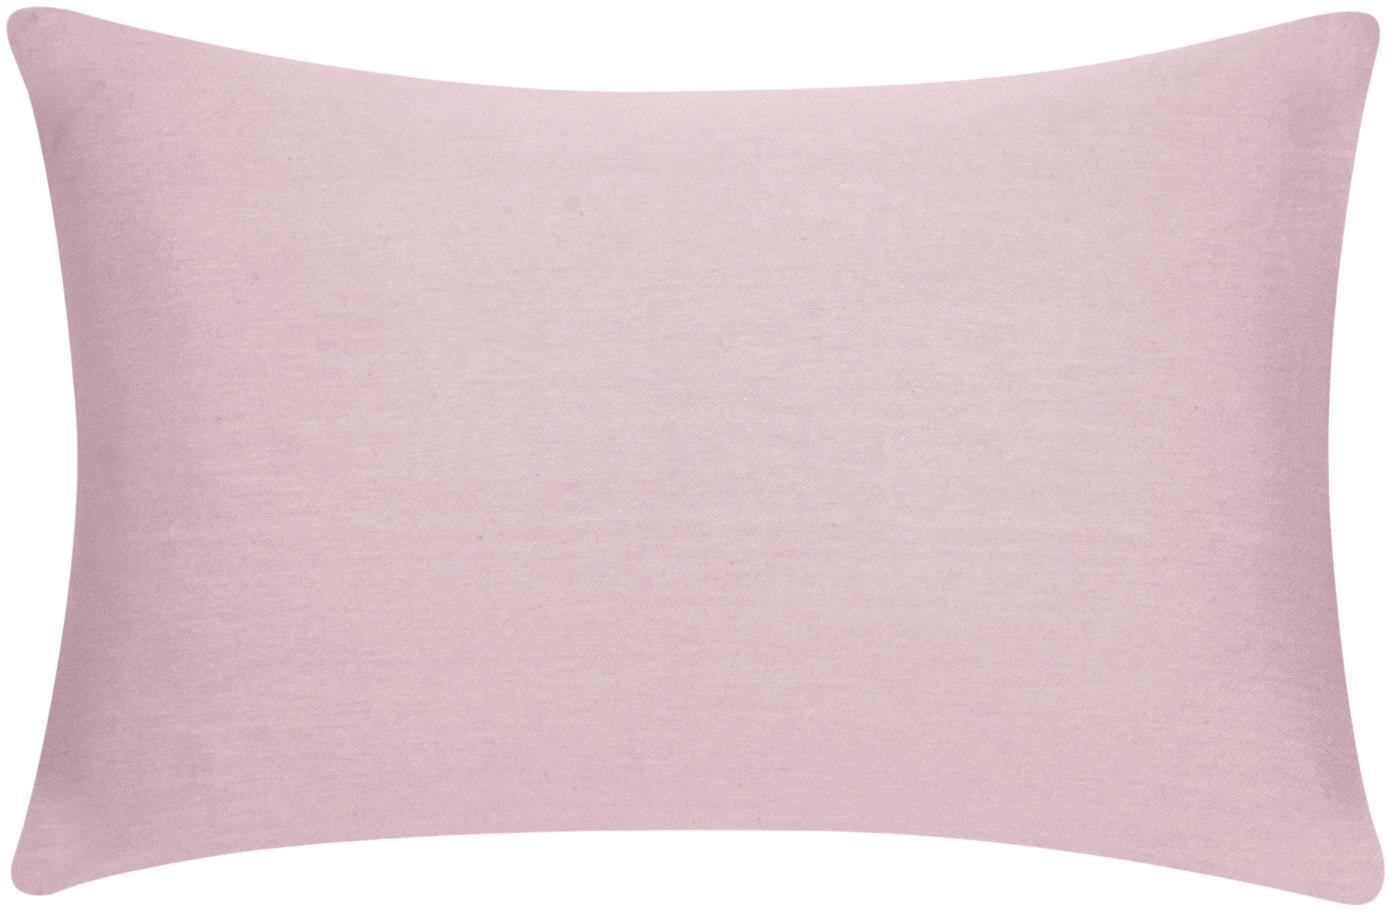 Baumwoll-Kissenhülle Mads in Rosa, 100% Baumwolle, Rosa, 30 x 50 cm